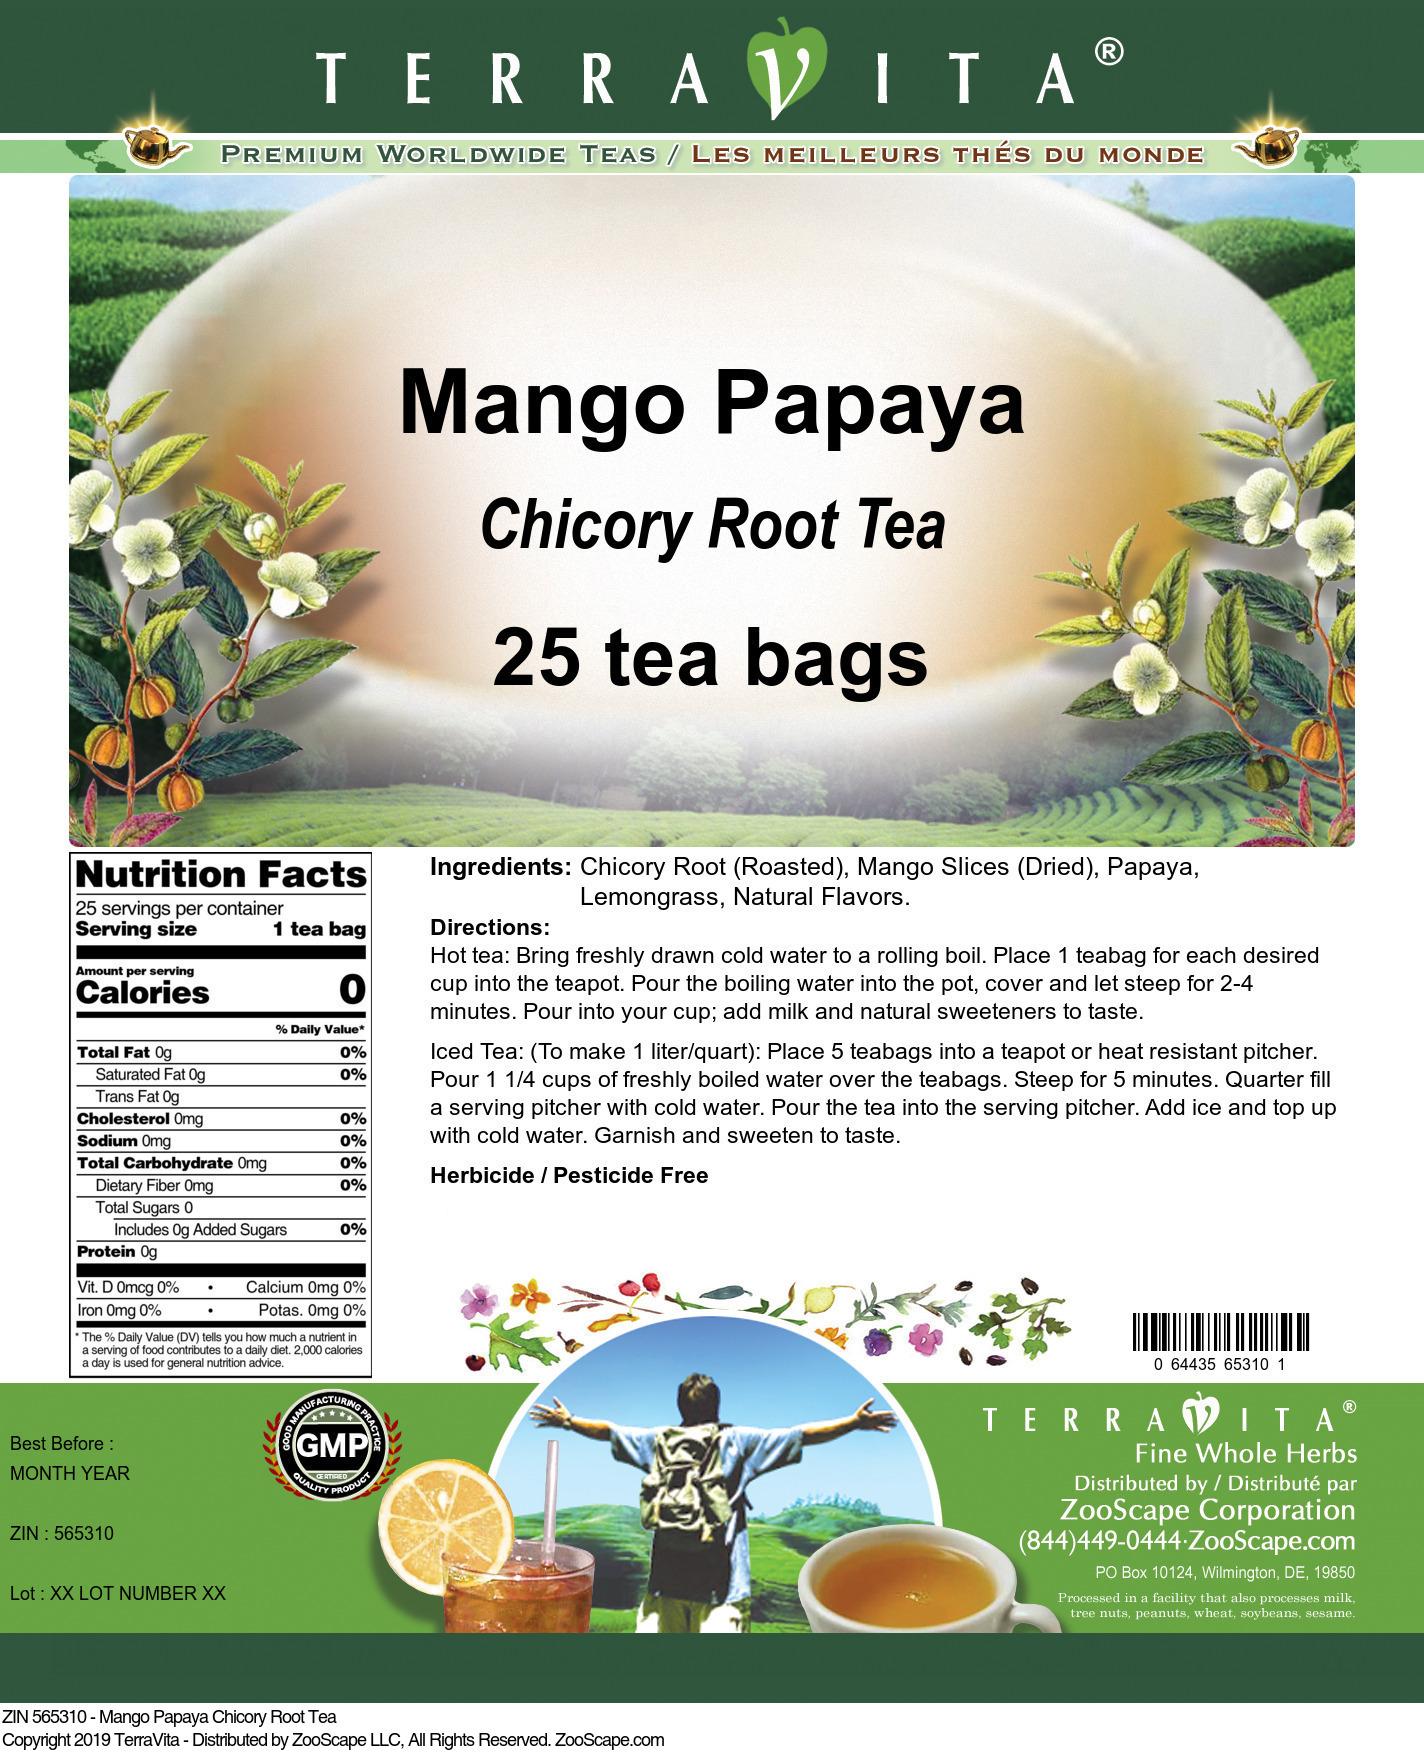 Mango Papaya Chicory Root Tea